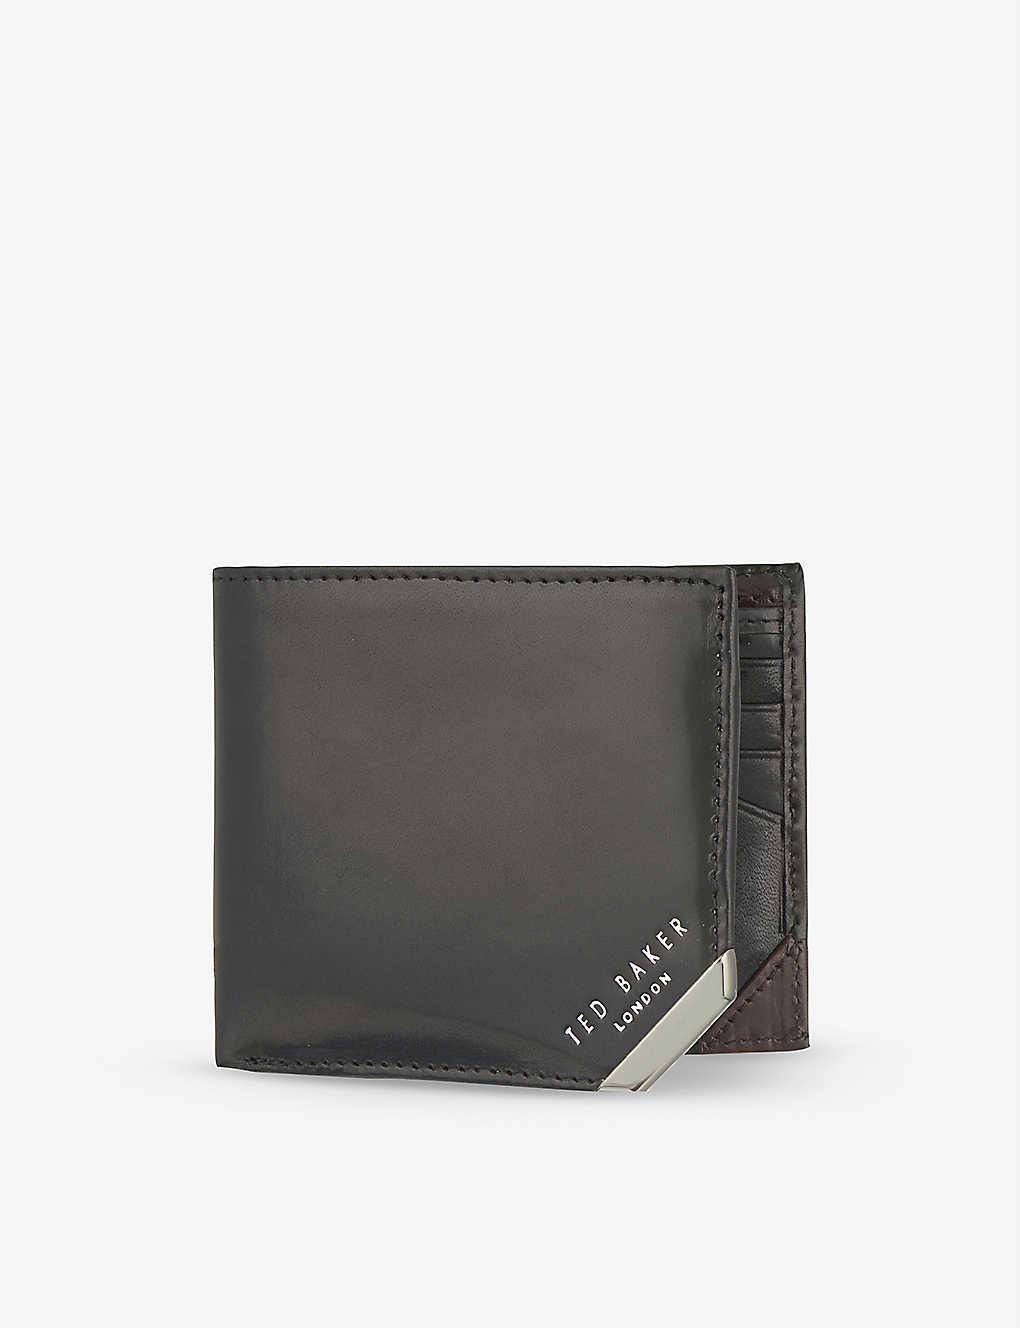 8e3a03f0f118 TED BAKER - Metal corner wallet